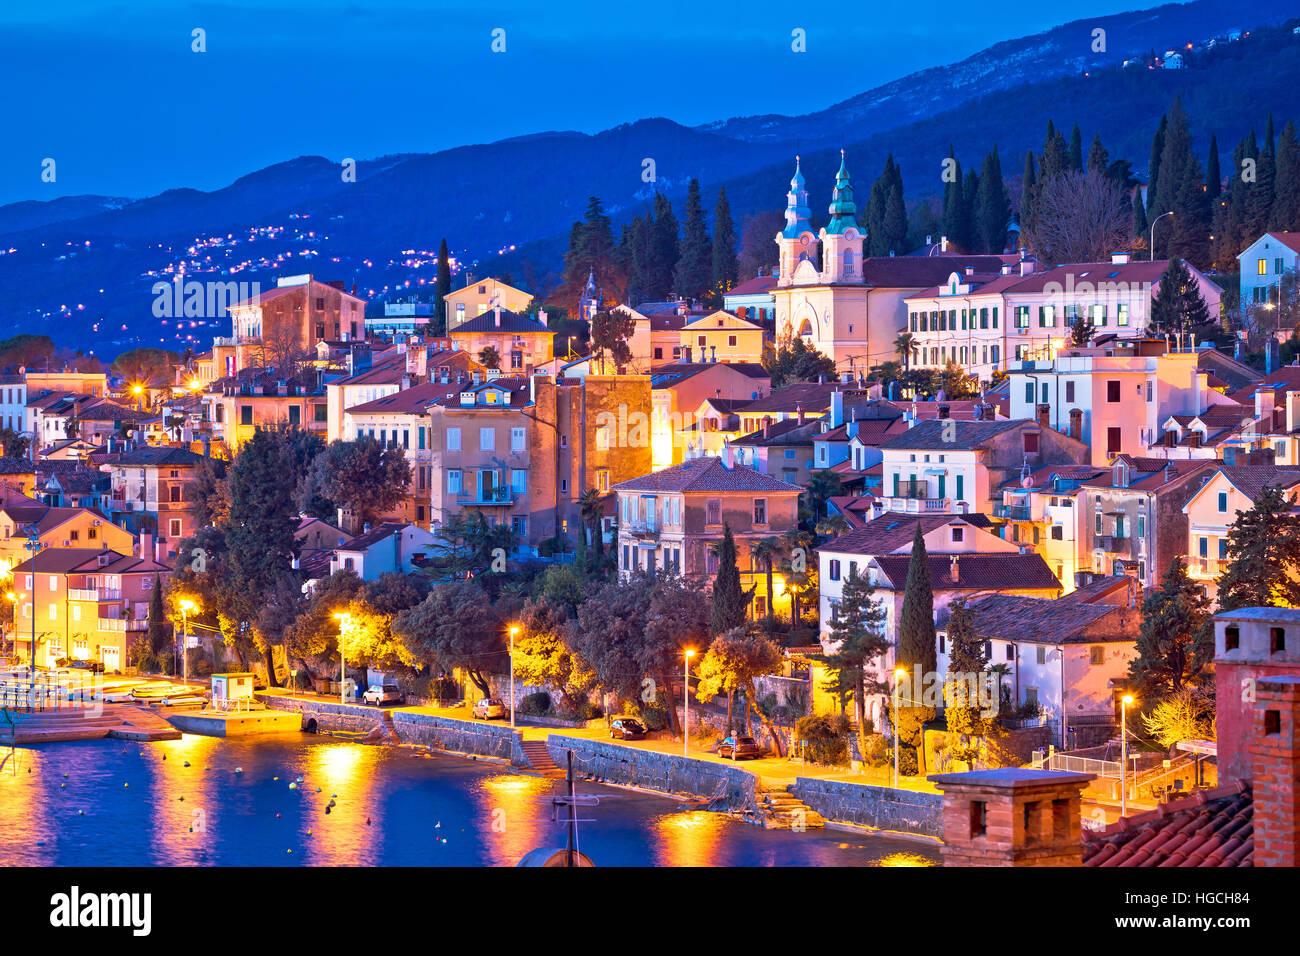 Town of Volosko evening waterfront view, Opatija riviera of Croatia - Stock Image